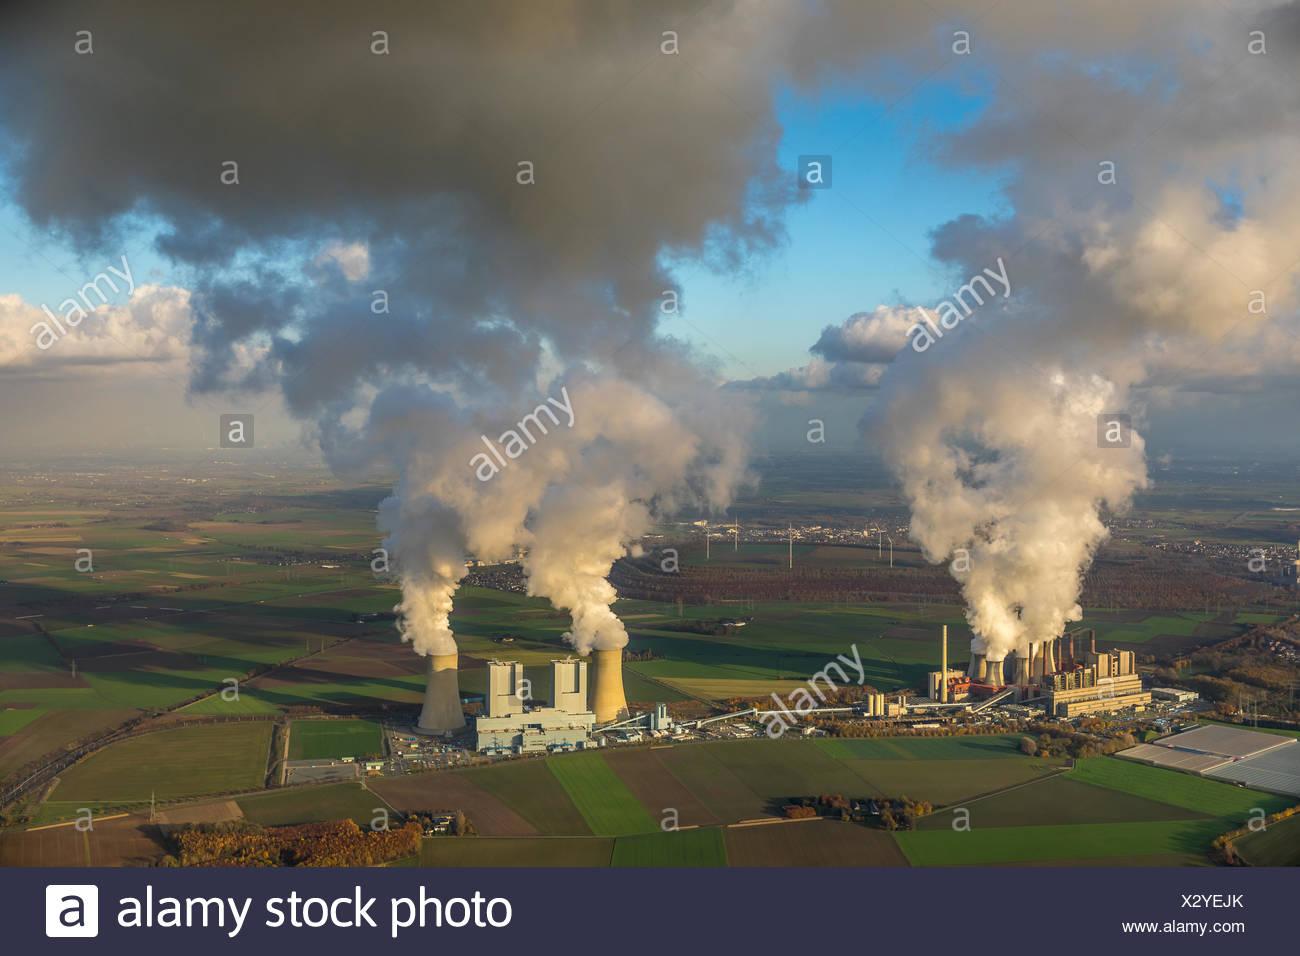 Lignite-fired power plant, RWE Power AG Neurath power station, BoA 2&3, Bergheim, Rhineland, North Rhine-Westphalia, Germany - Stock Image